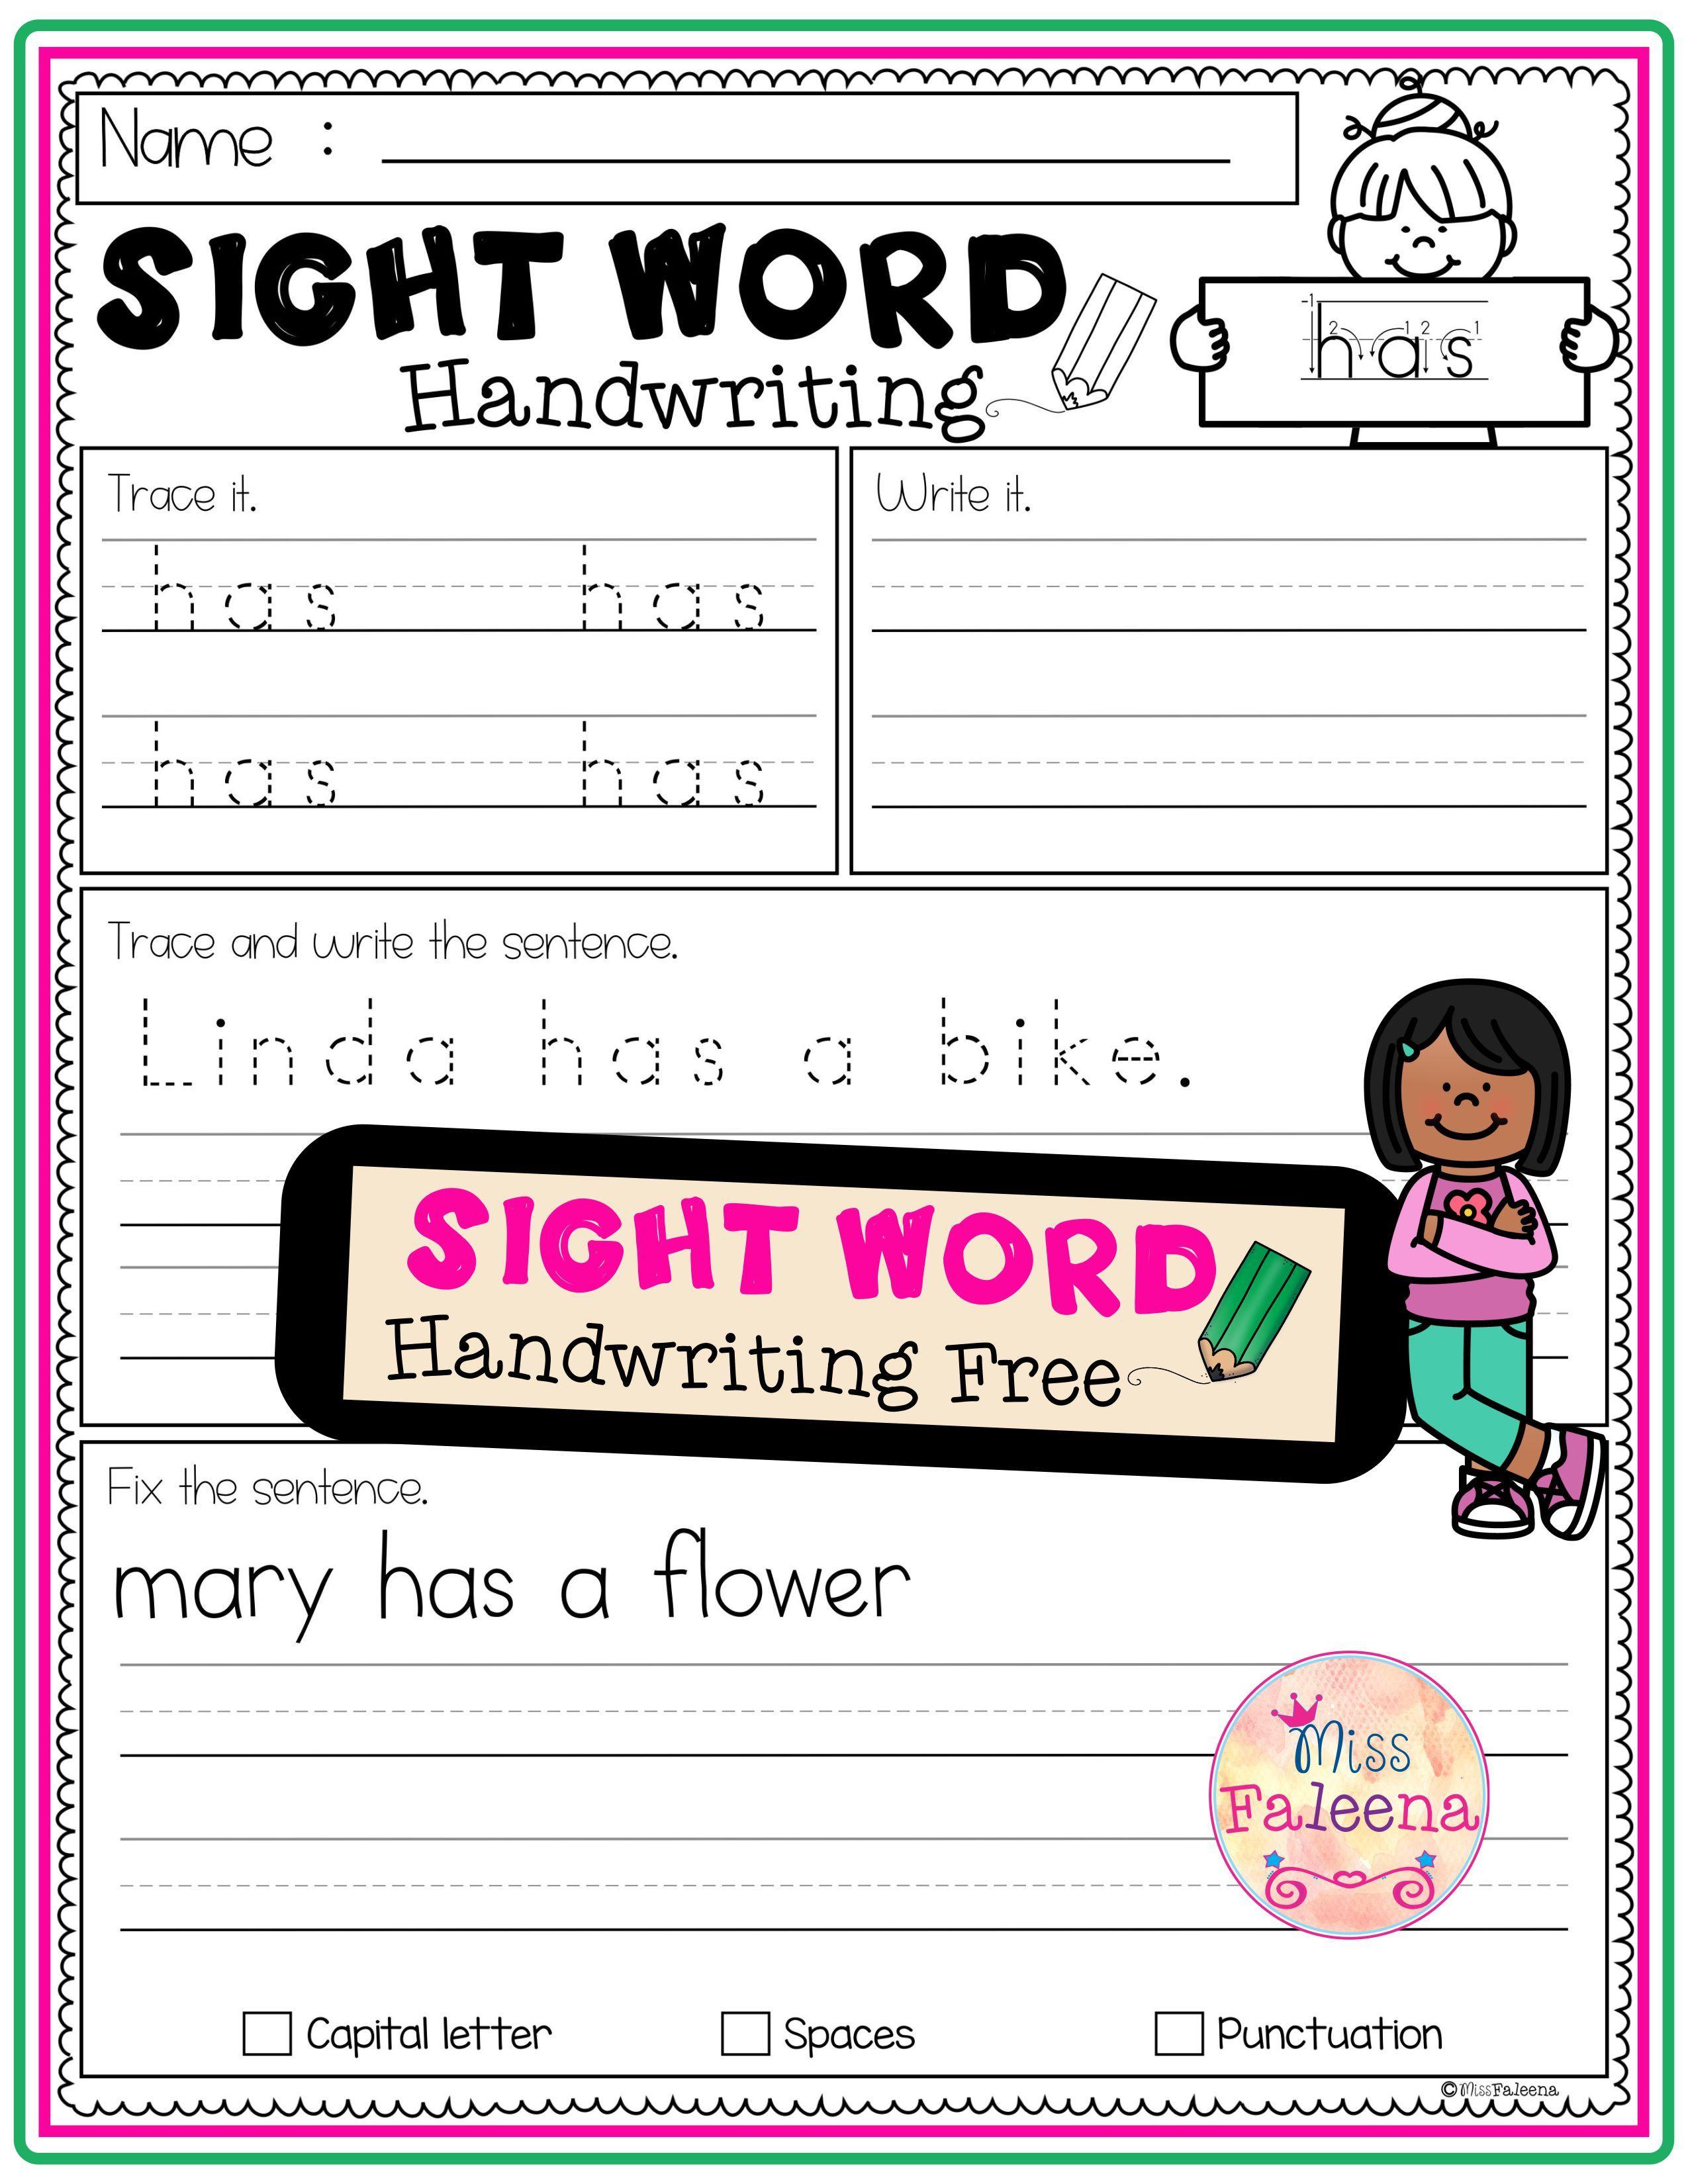 Free Sight Word Handwriting